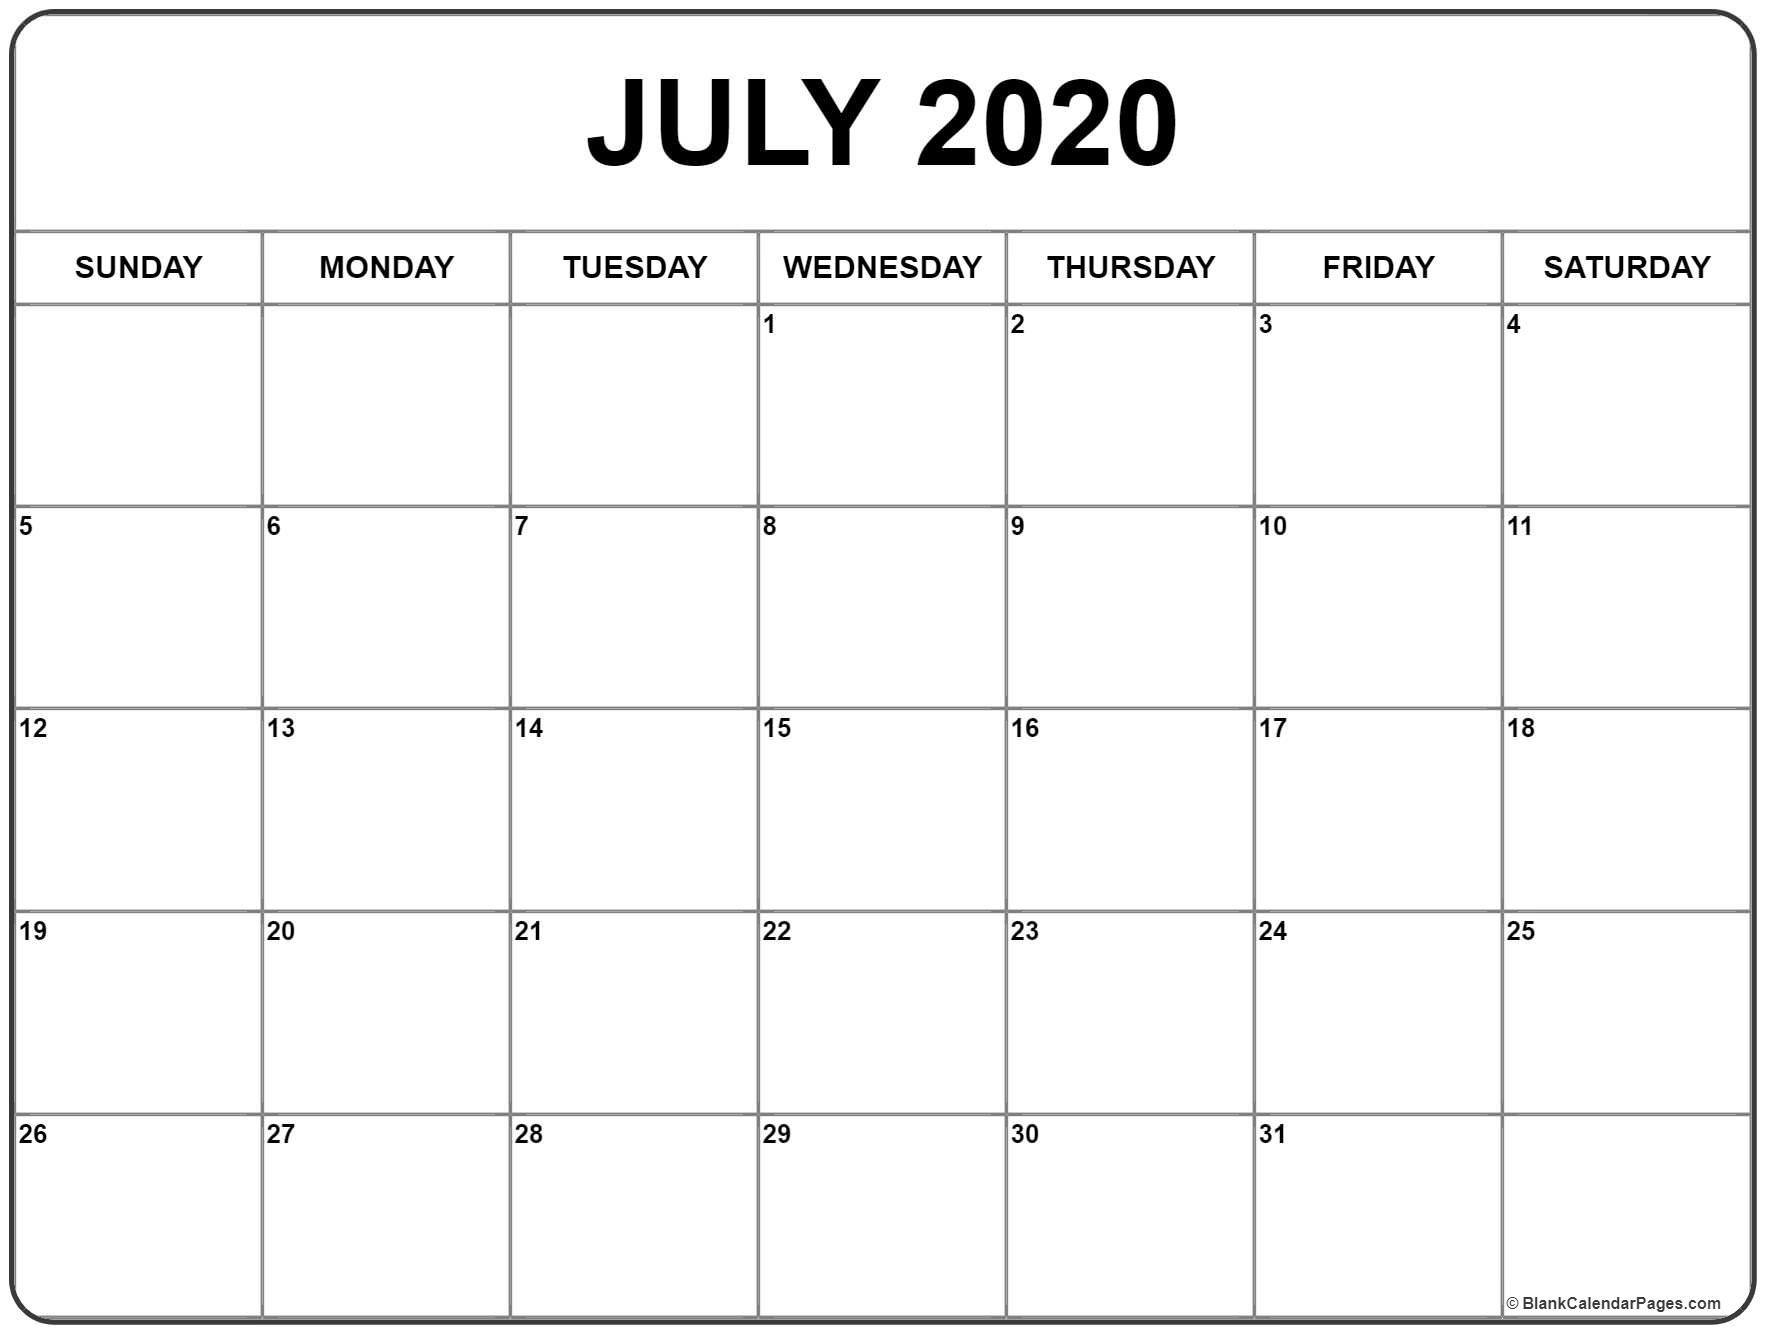 Free July Holidays 2020 Calendar Printable For Usa Uk Canada